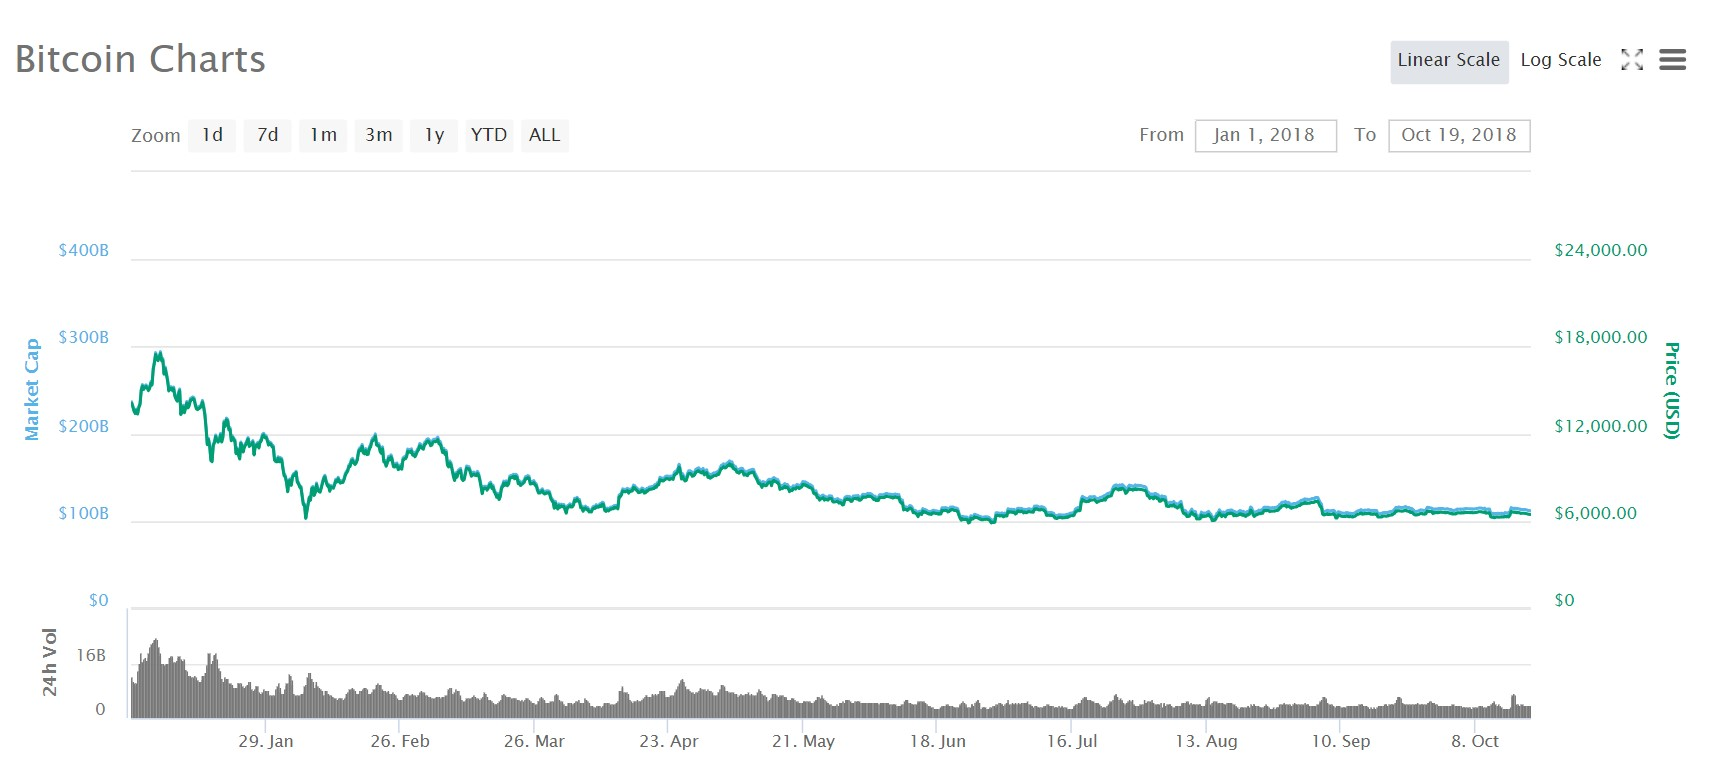 Bitcoins prisutveckling under 2018.